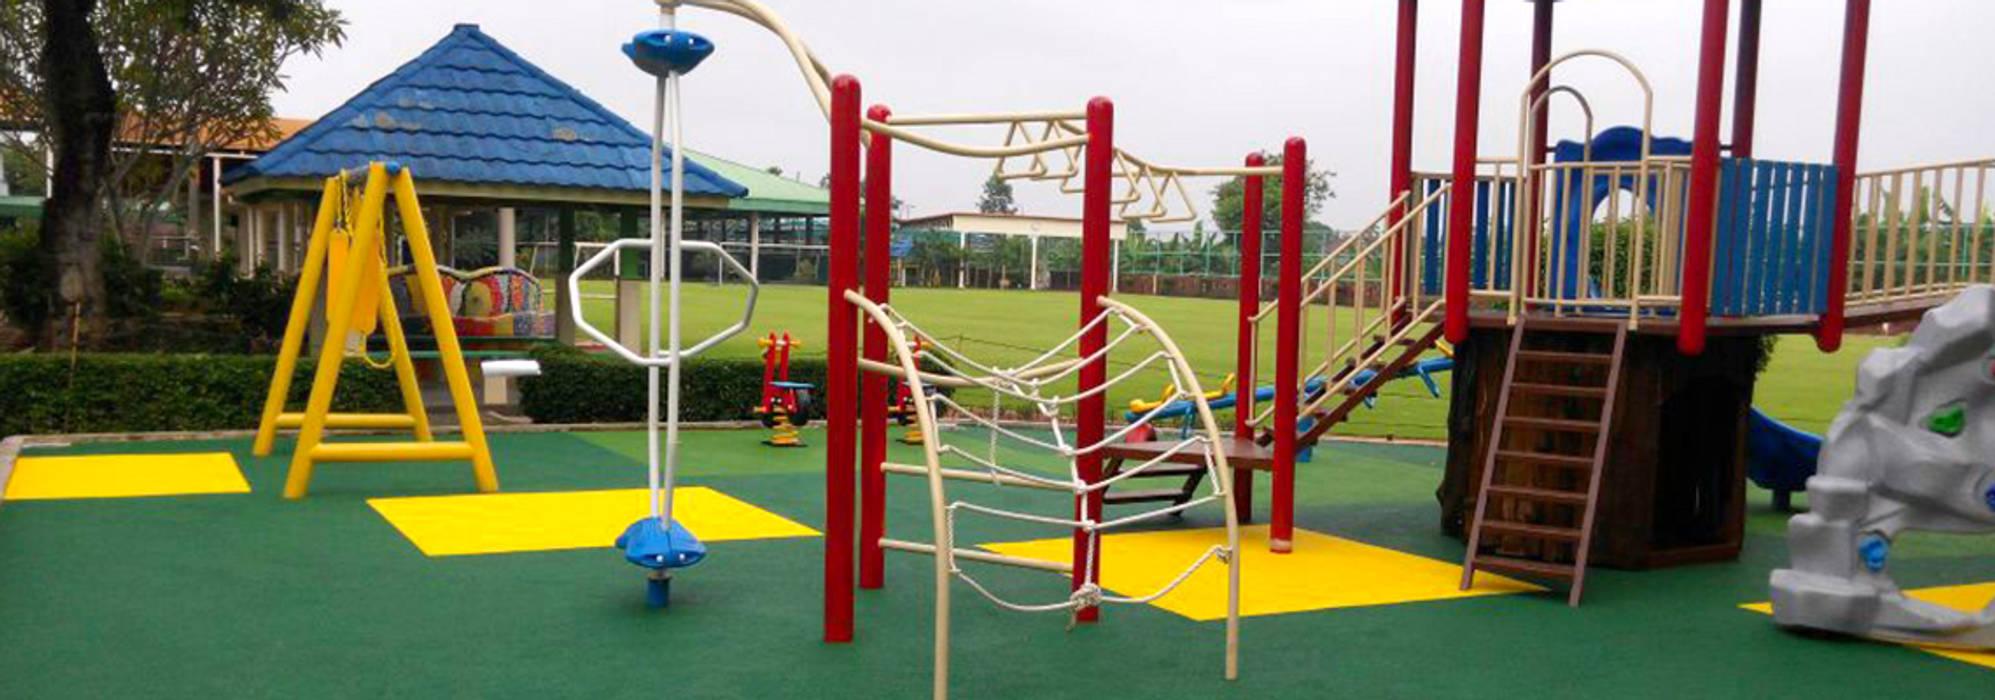 Playground Jakarta Intenational Korea School Sekolah Modern Oleh PT. Datra Internusa Modern